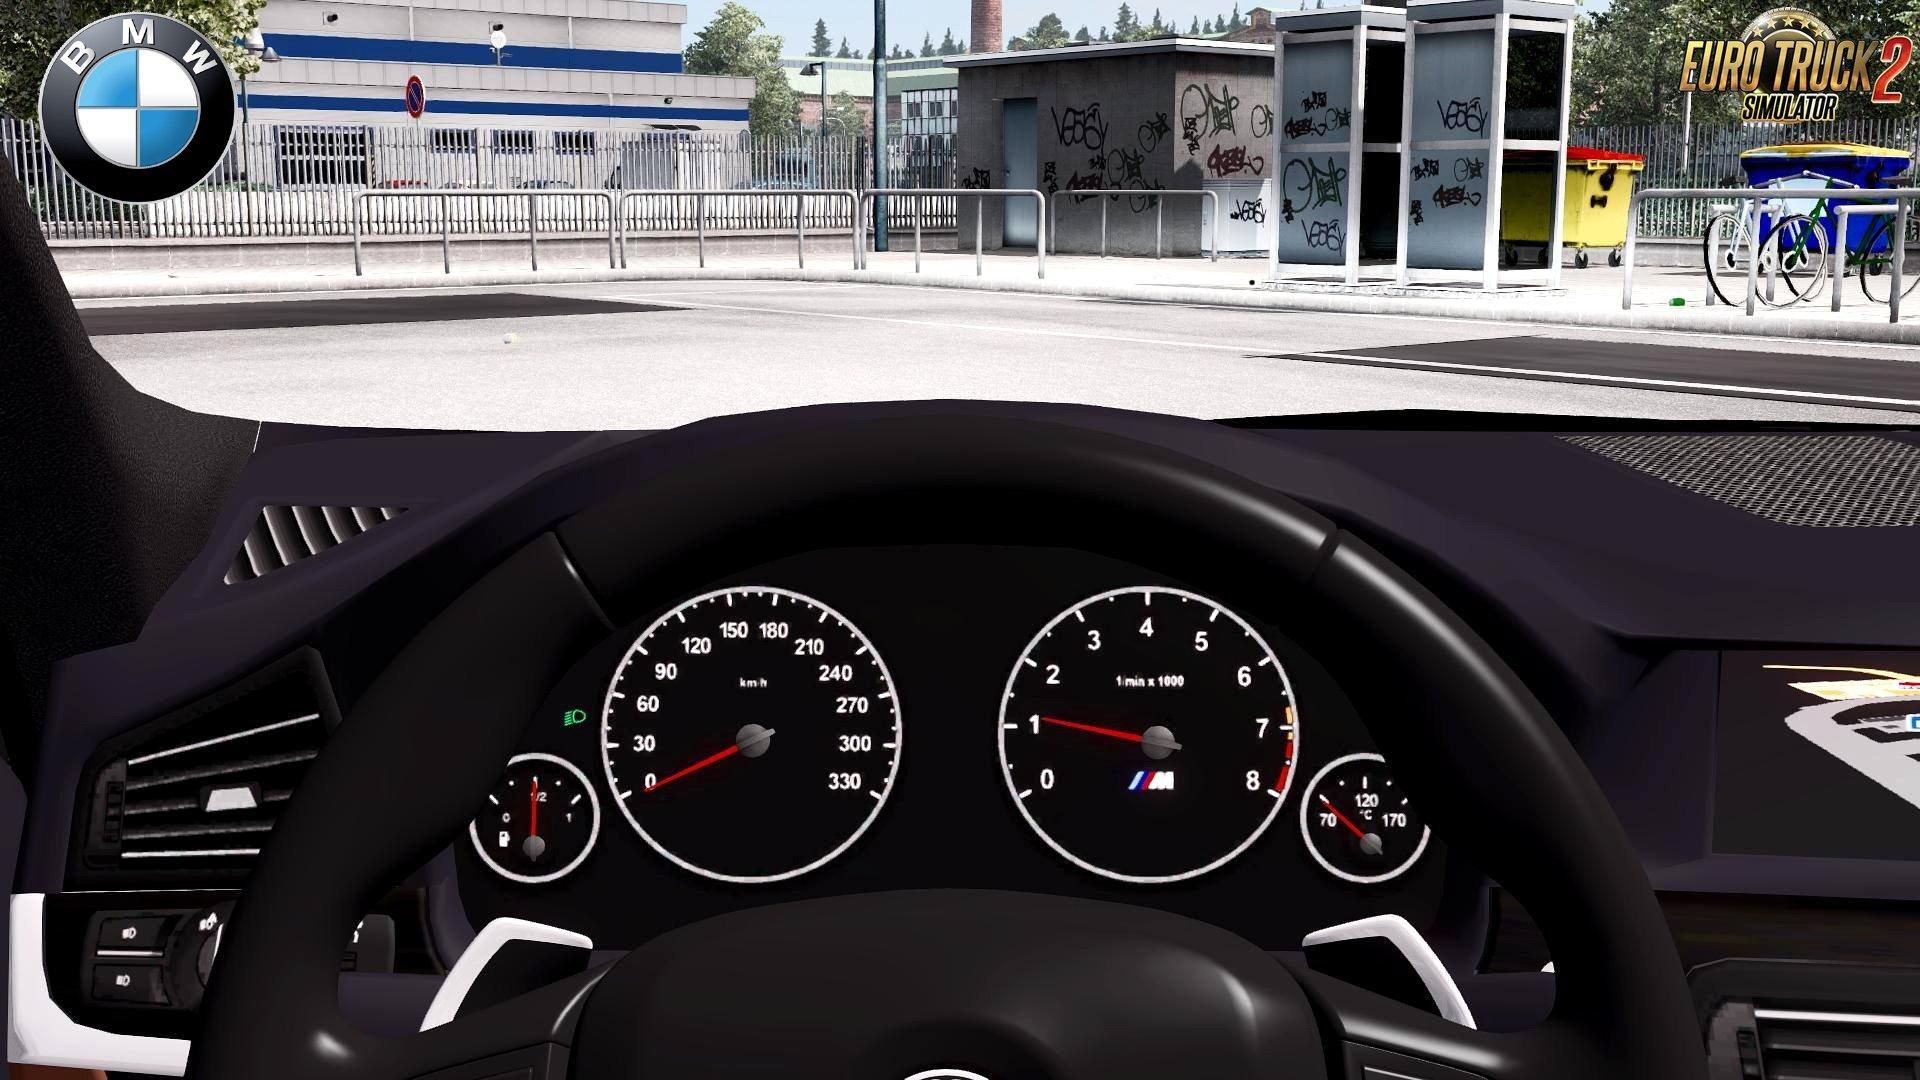 BMW M5 F10 Interior V30 Upgraded 128x ETS2 Mods